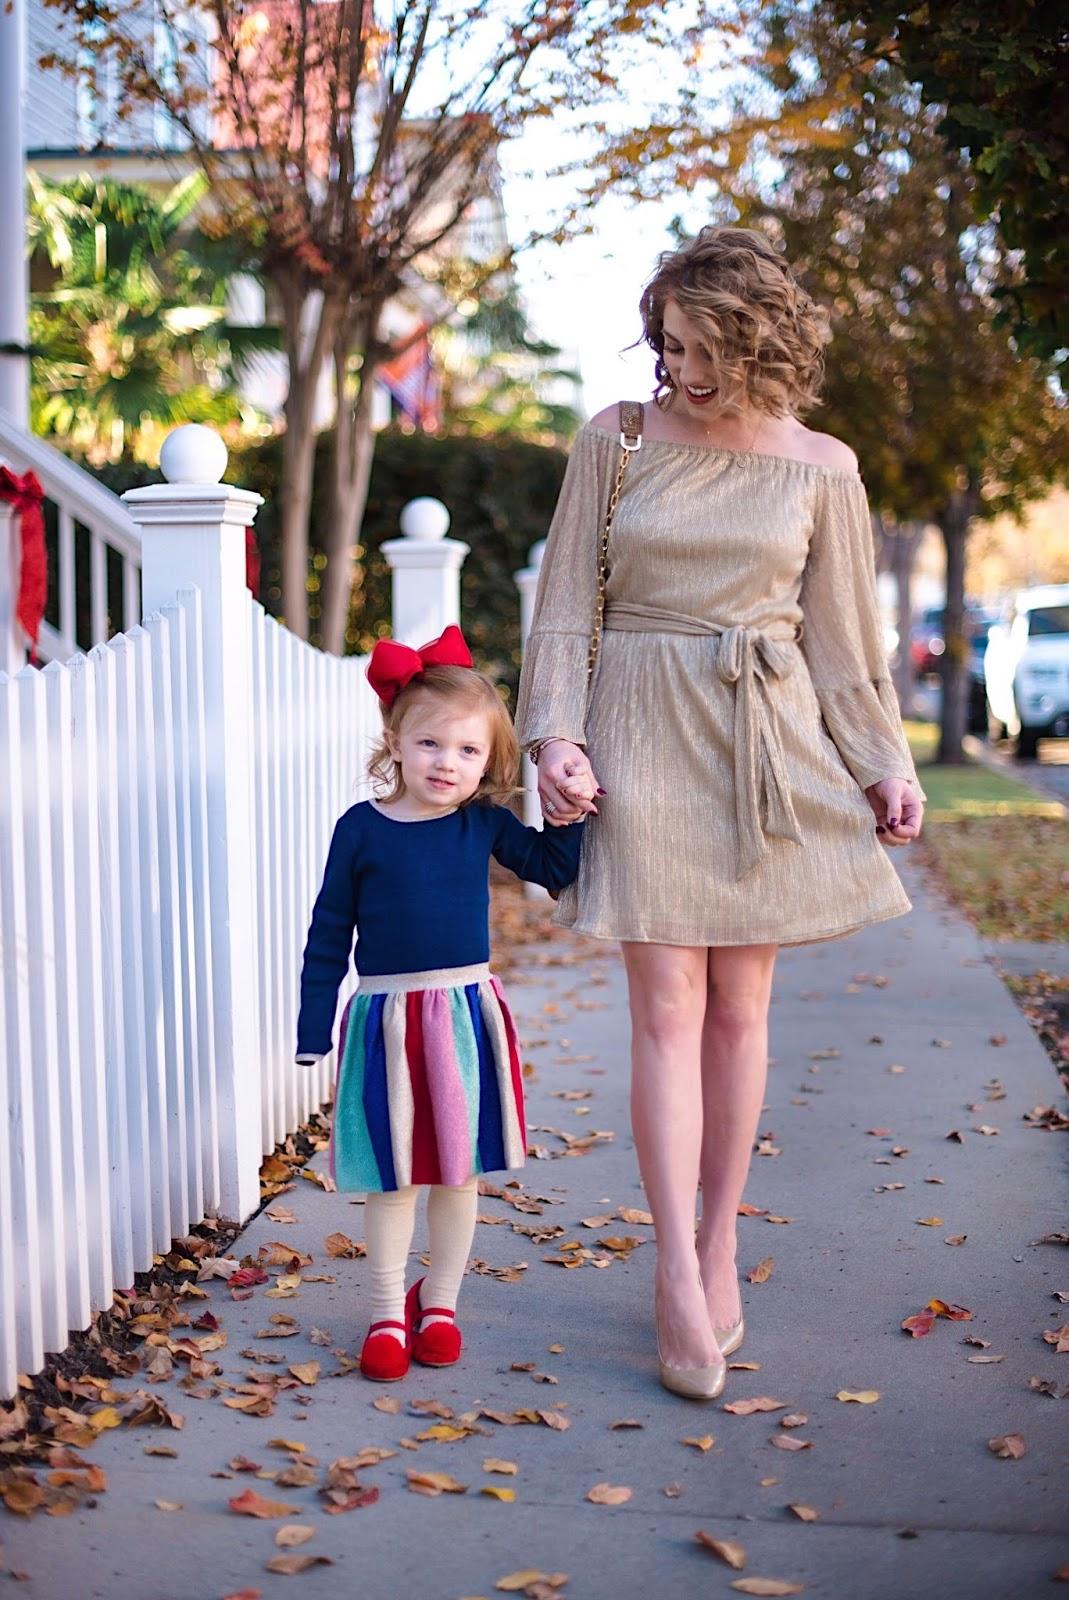 Mommy & Me Dressed Festively - Something Delightful Blog